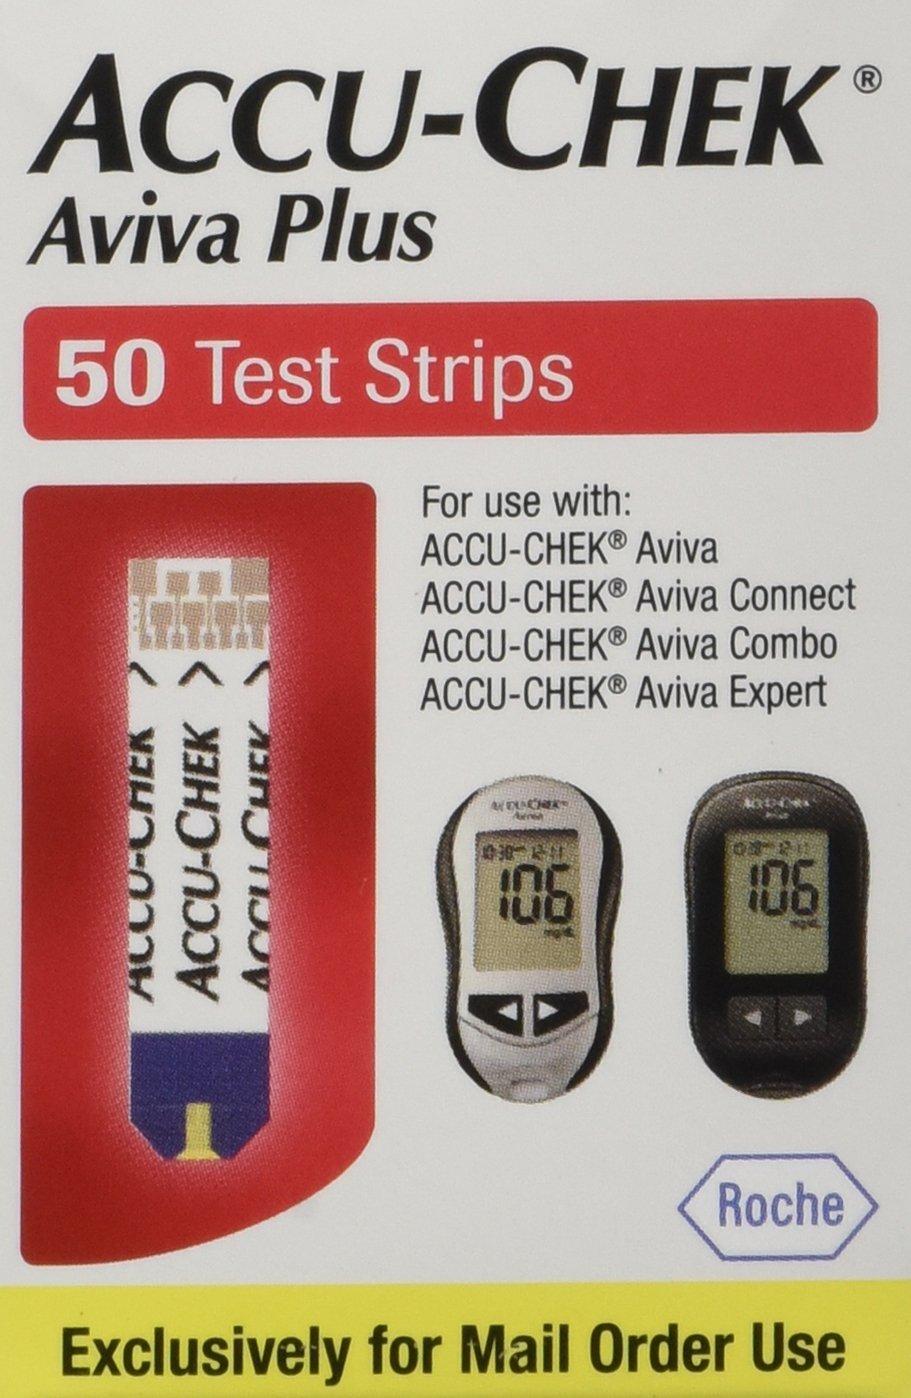 ACCU-CHEK Aviva Plus Test Strips, 50 Count by ACCU-CHEK